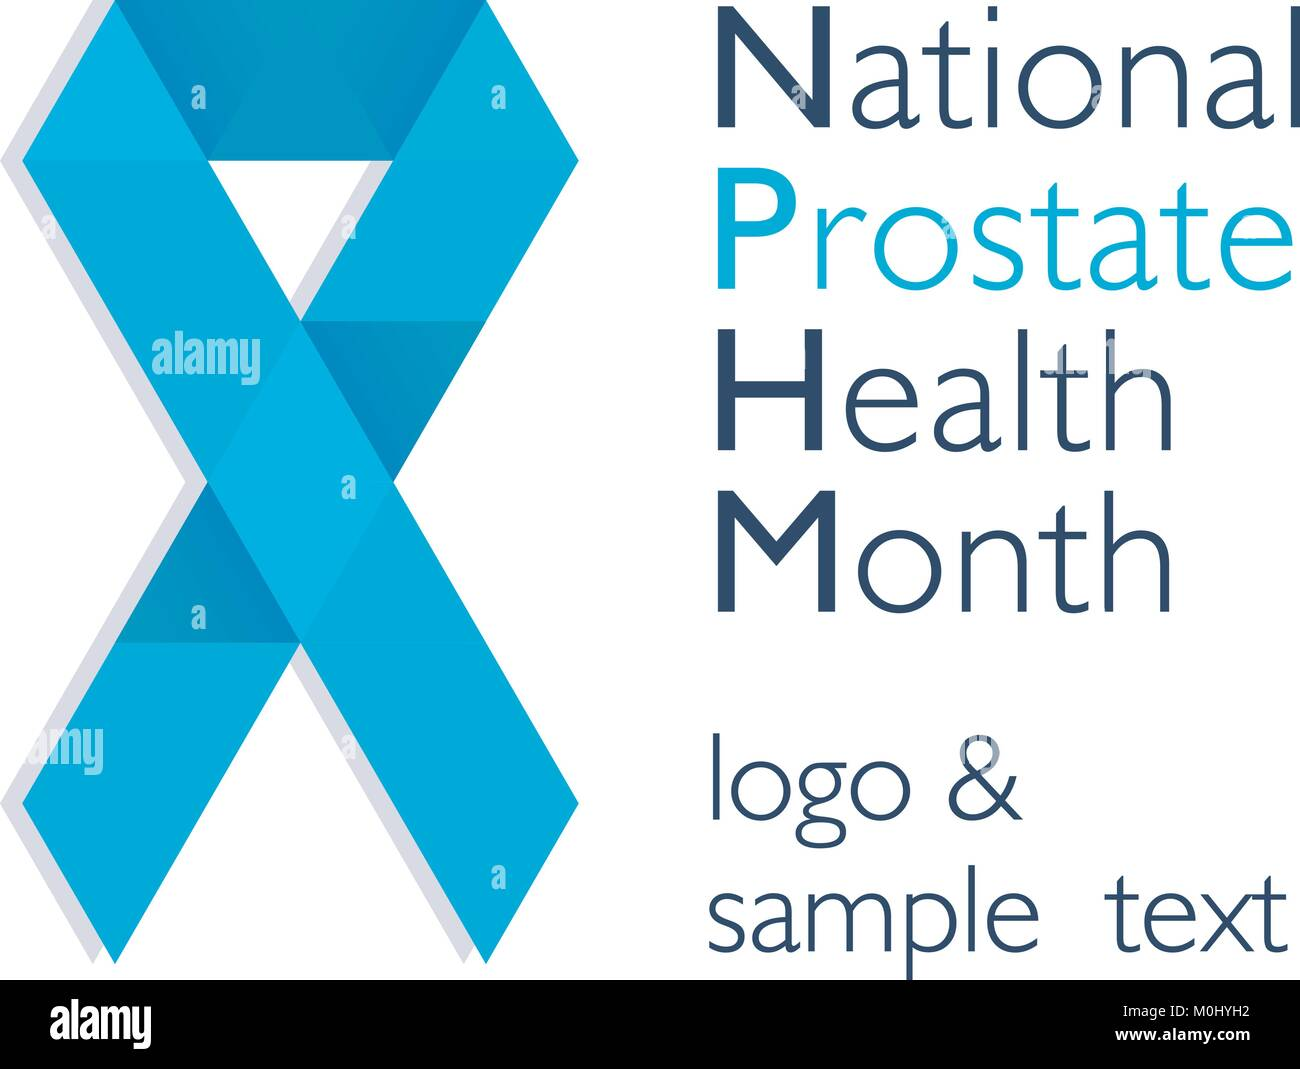 Men Health Prostate Cancer November Awareness Month Poster For